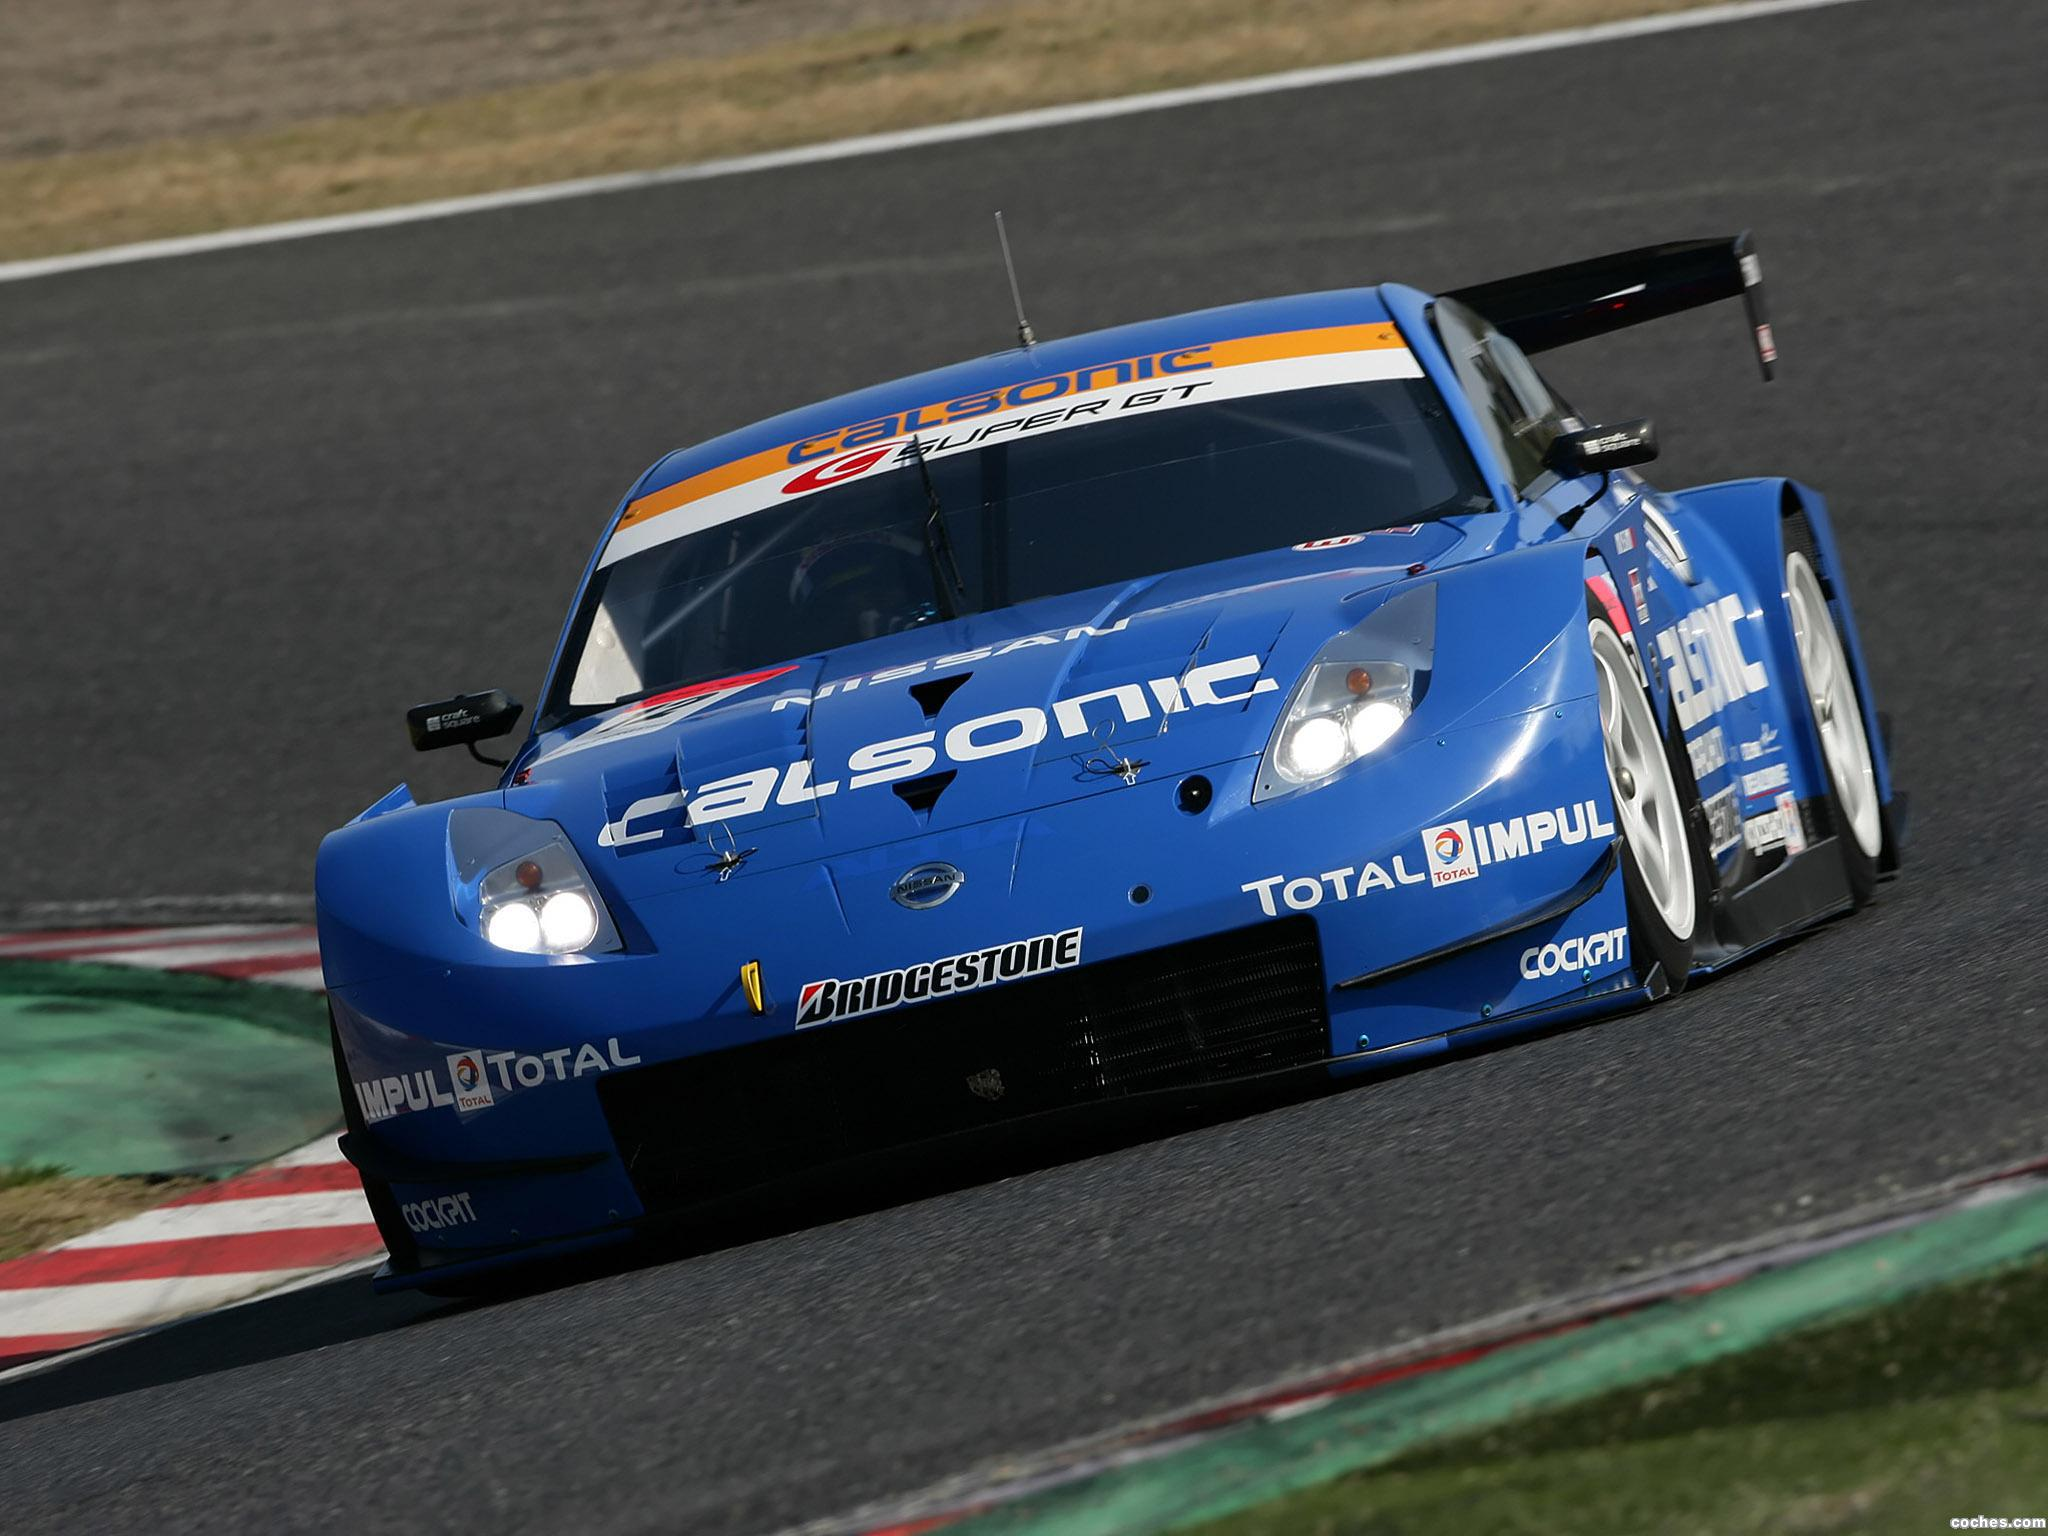 Foto 0 de Nissan NISMO 350Z Super GT Z33 2007